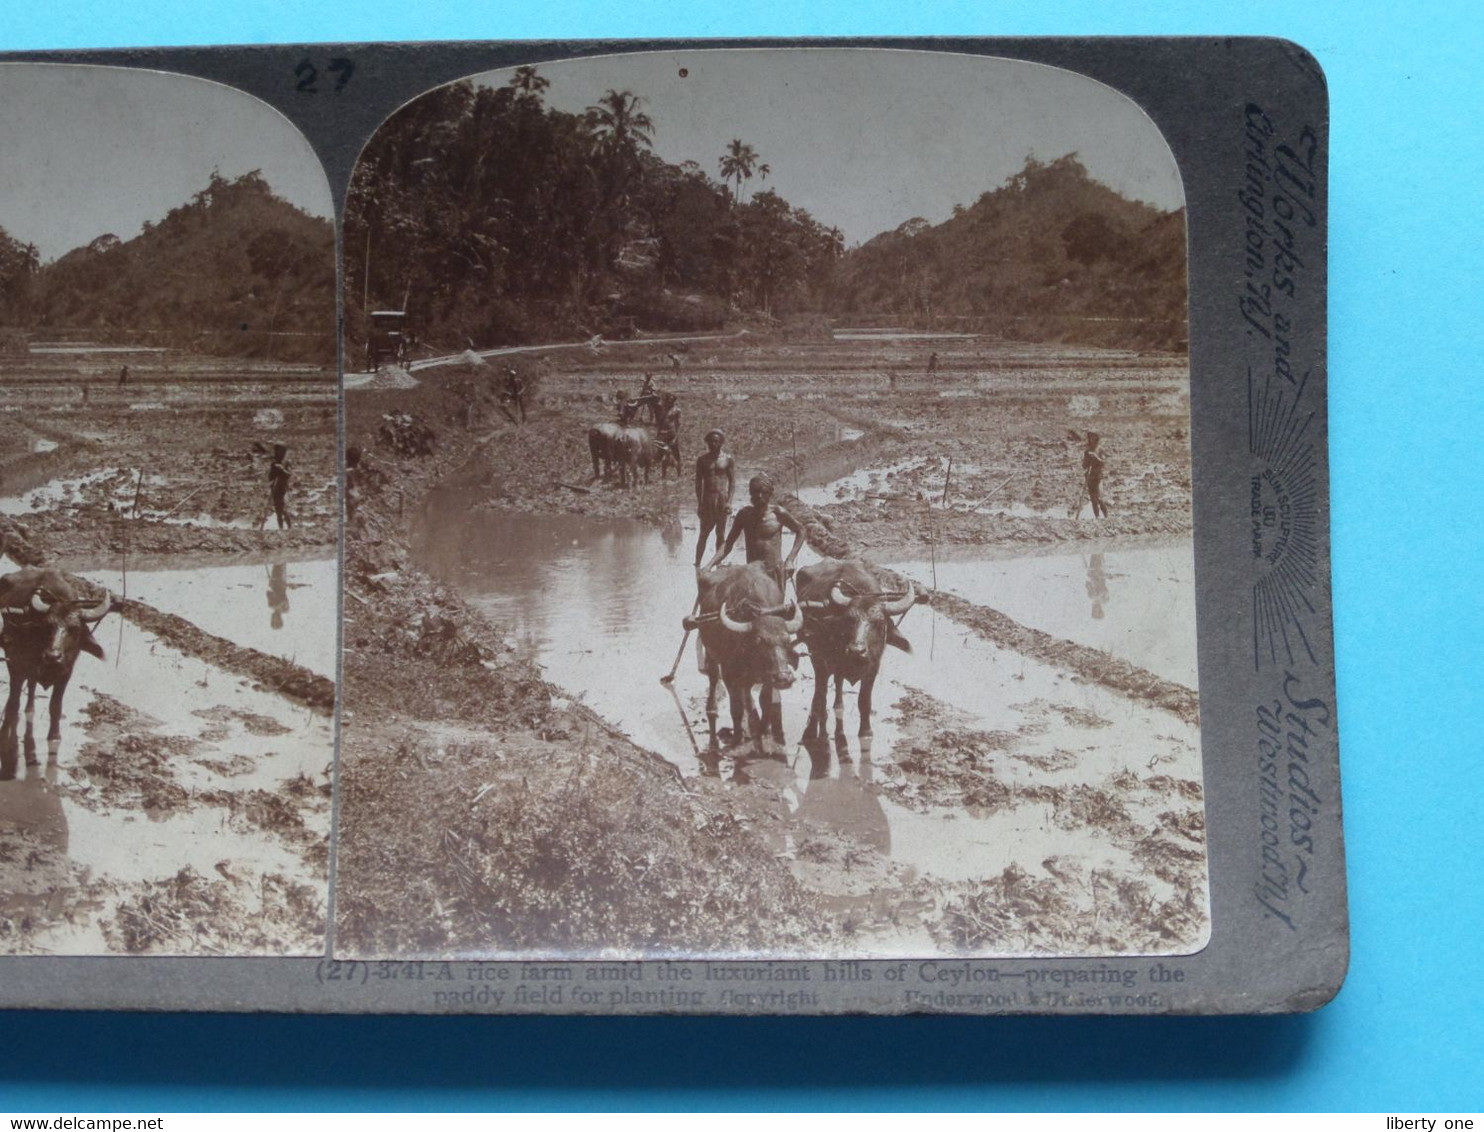 A RICE Farm Amid The Luxuriant Hills Of > CEYLON (N° 27-3741) ( Stereo Photo : Underwood USA ) SRI-LANKA ! - Stereoscopio